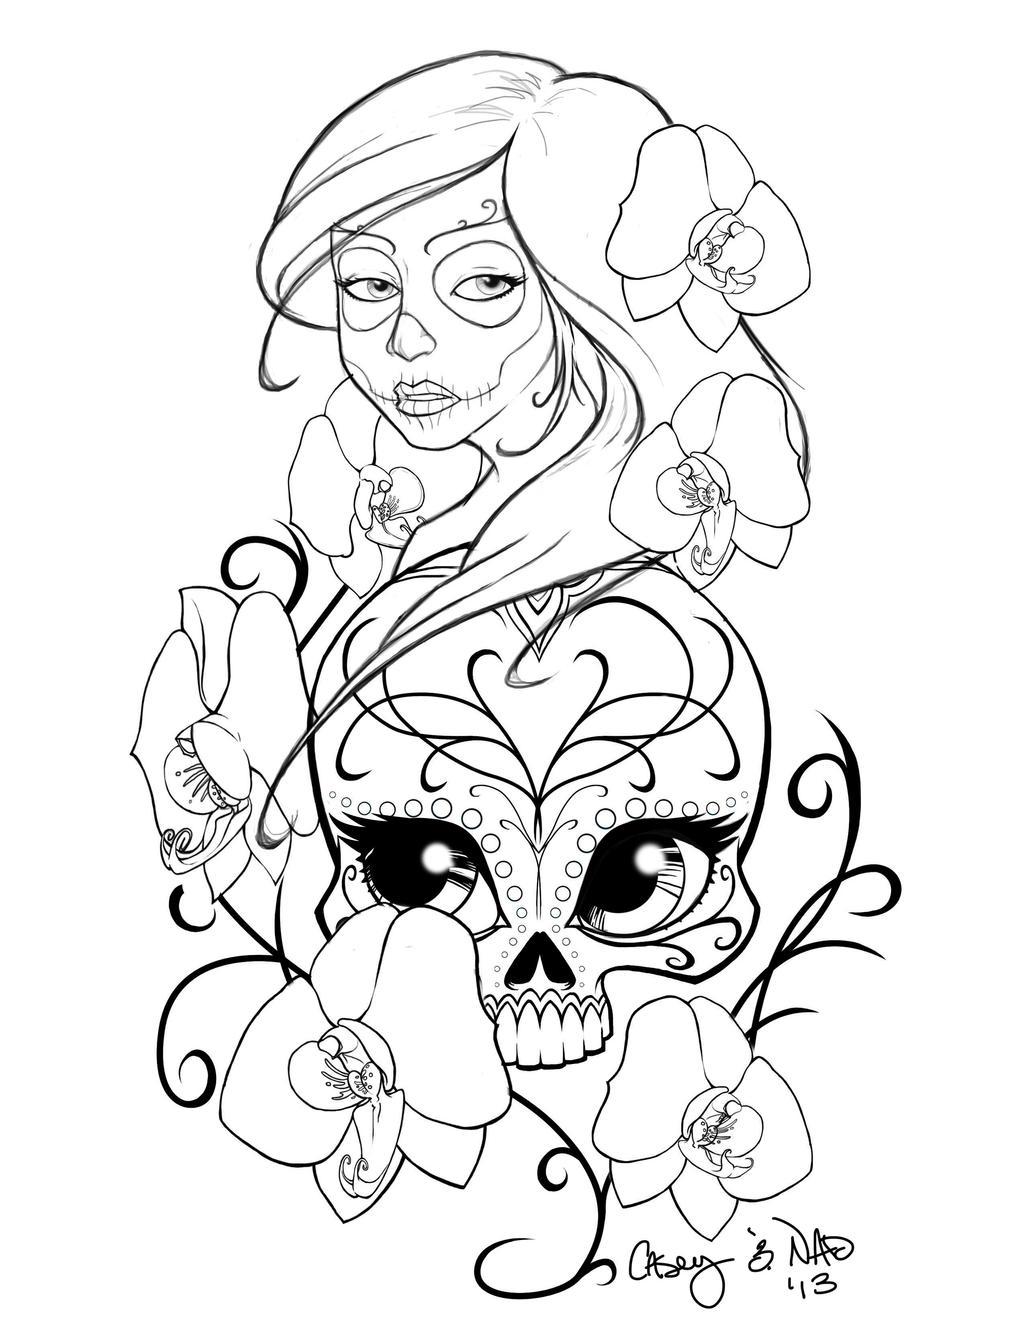 Sugar skull sleeve tattoo design by kcspaghetti on deviantart